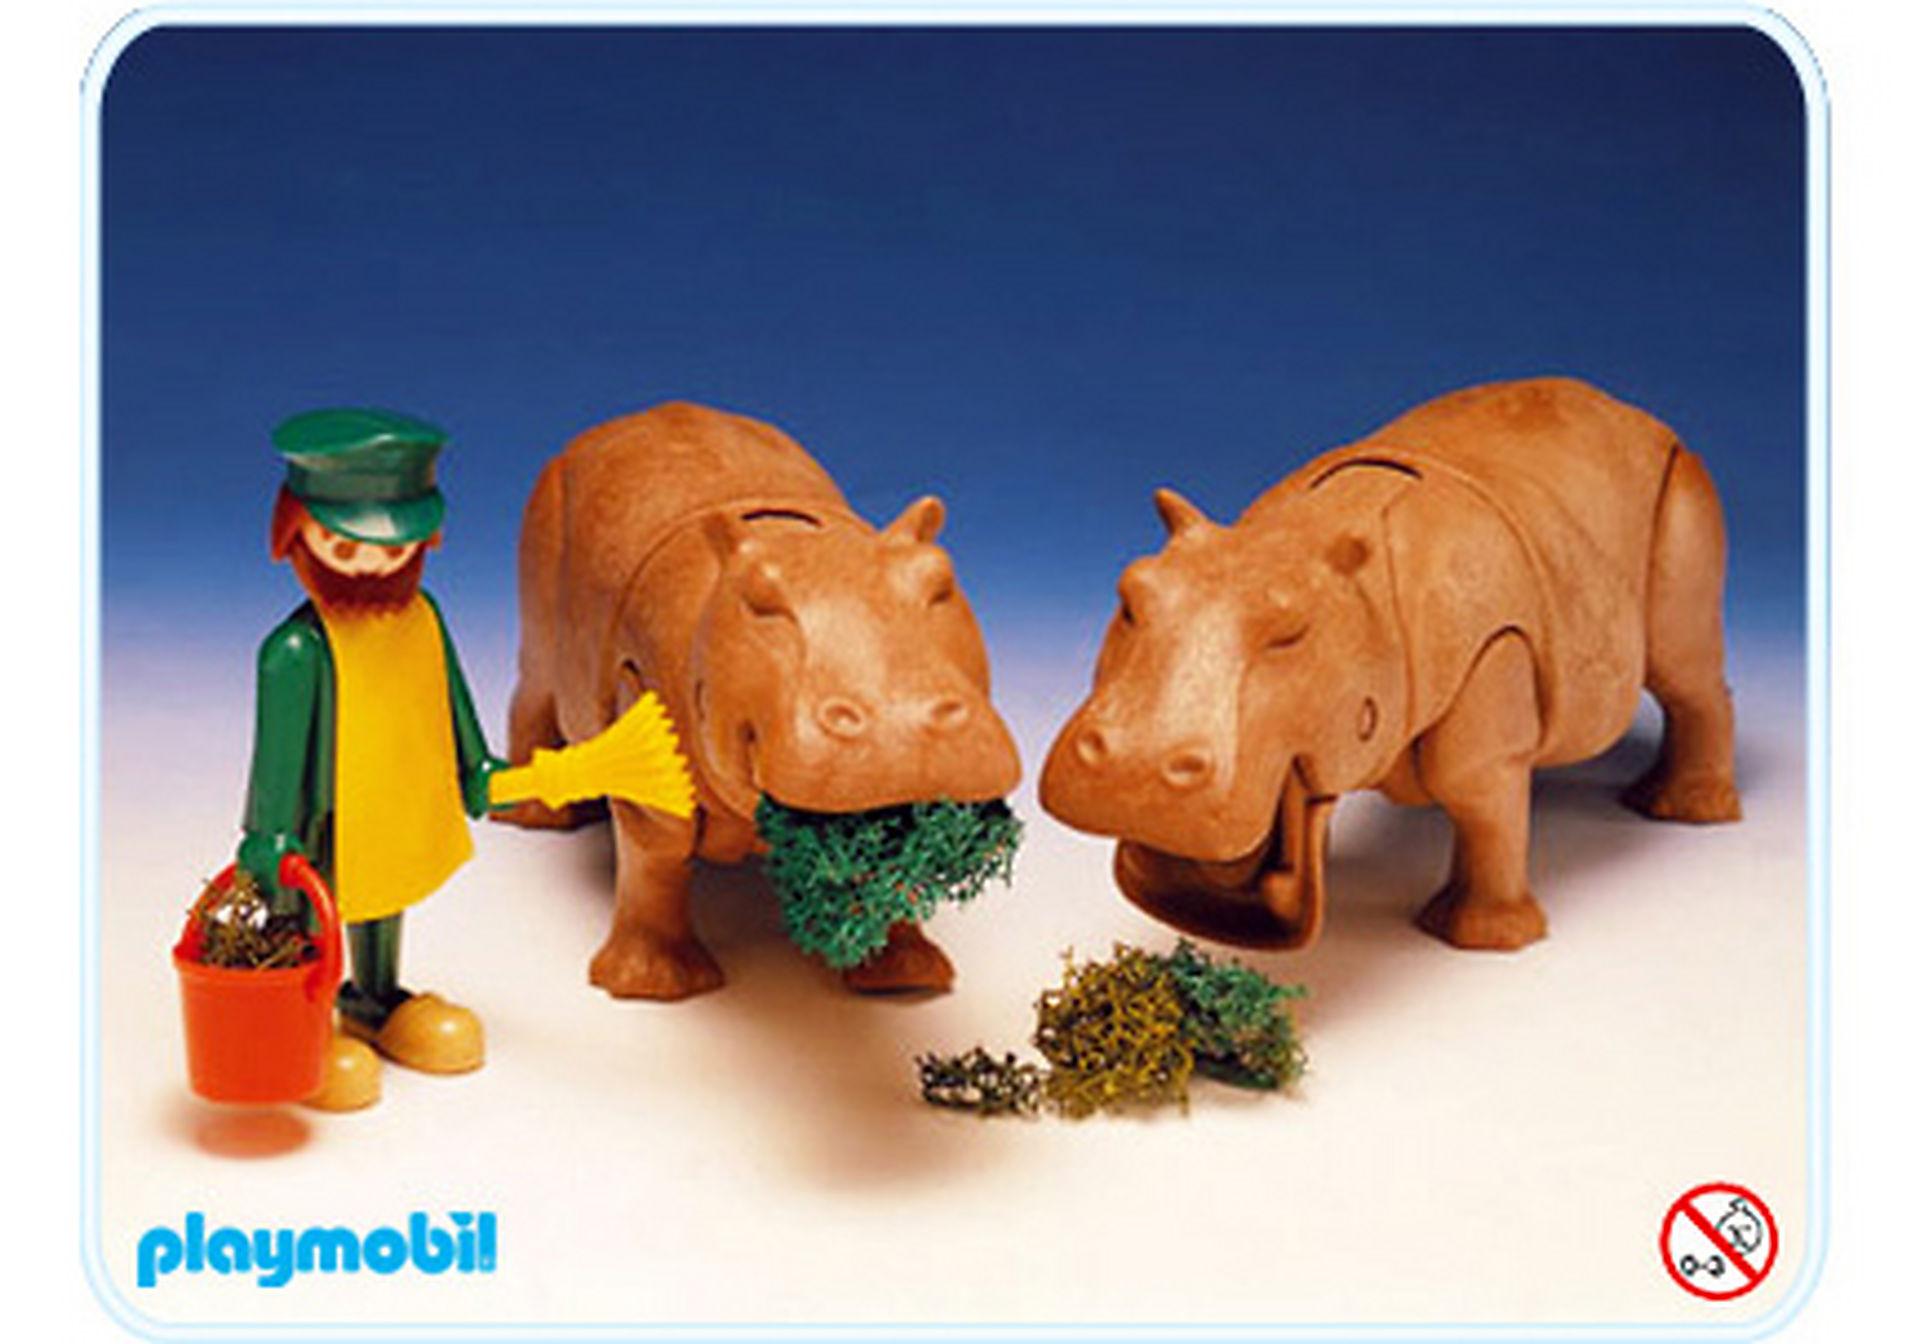 http://media.playmobil.com/i/playmobil/3547-A_product_detail/gardien/2 hippopotames